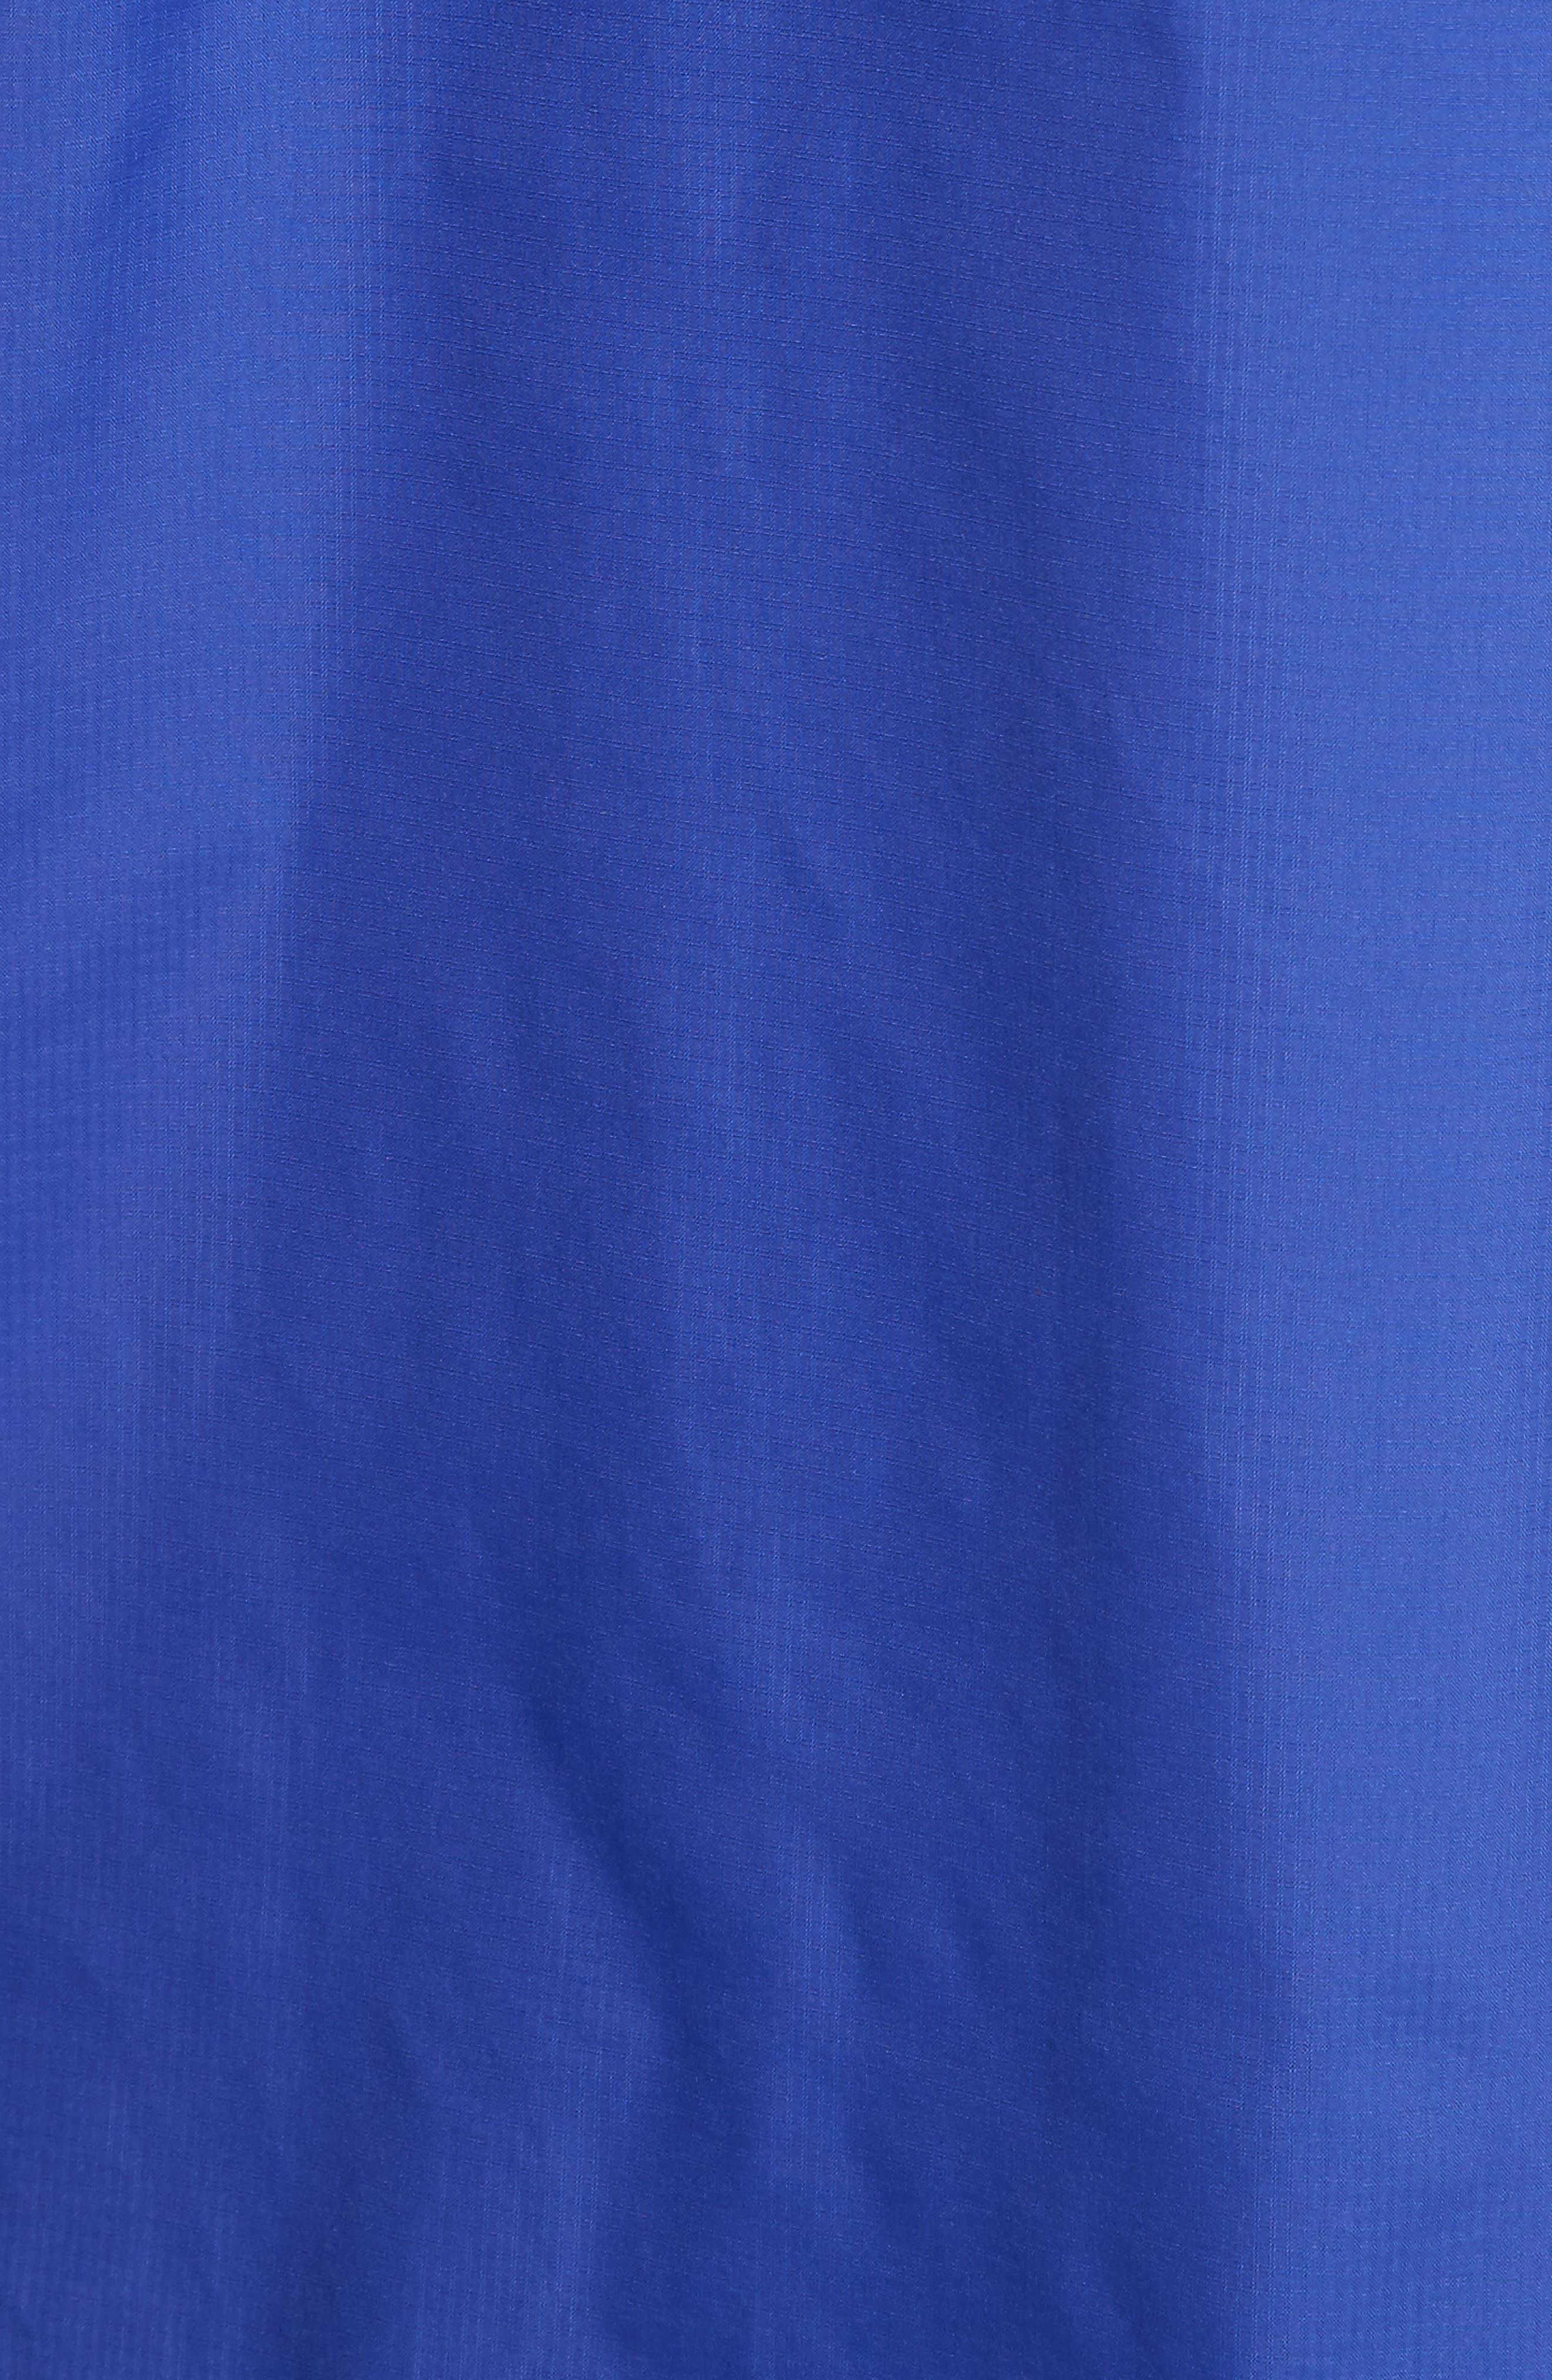 Unisex Rain Poncho,                             Alternate thumbnail 6, color,                             Lapis Blue